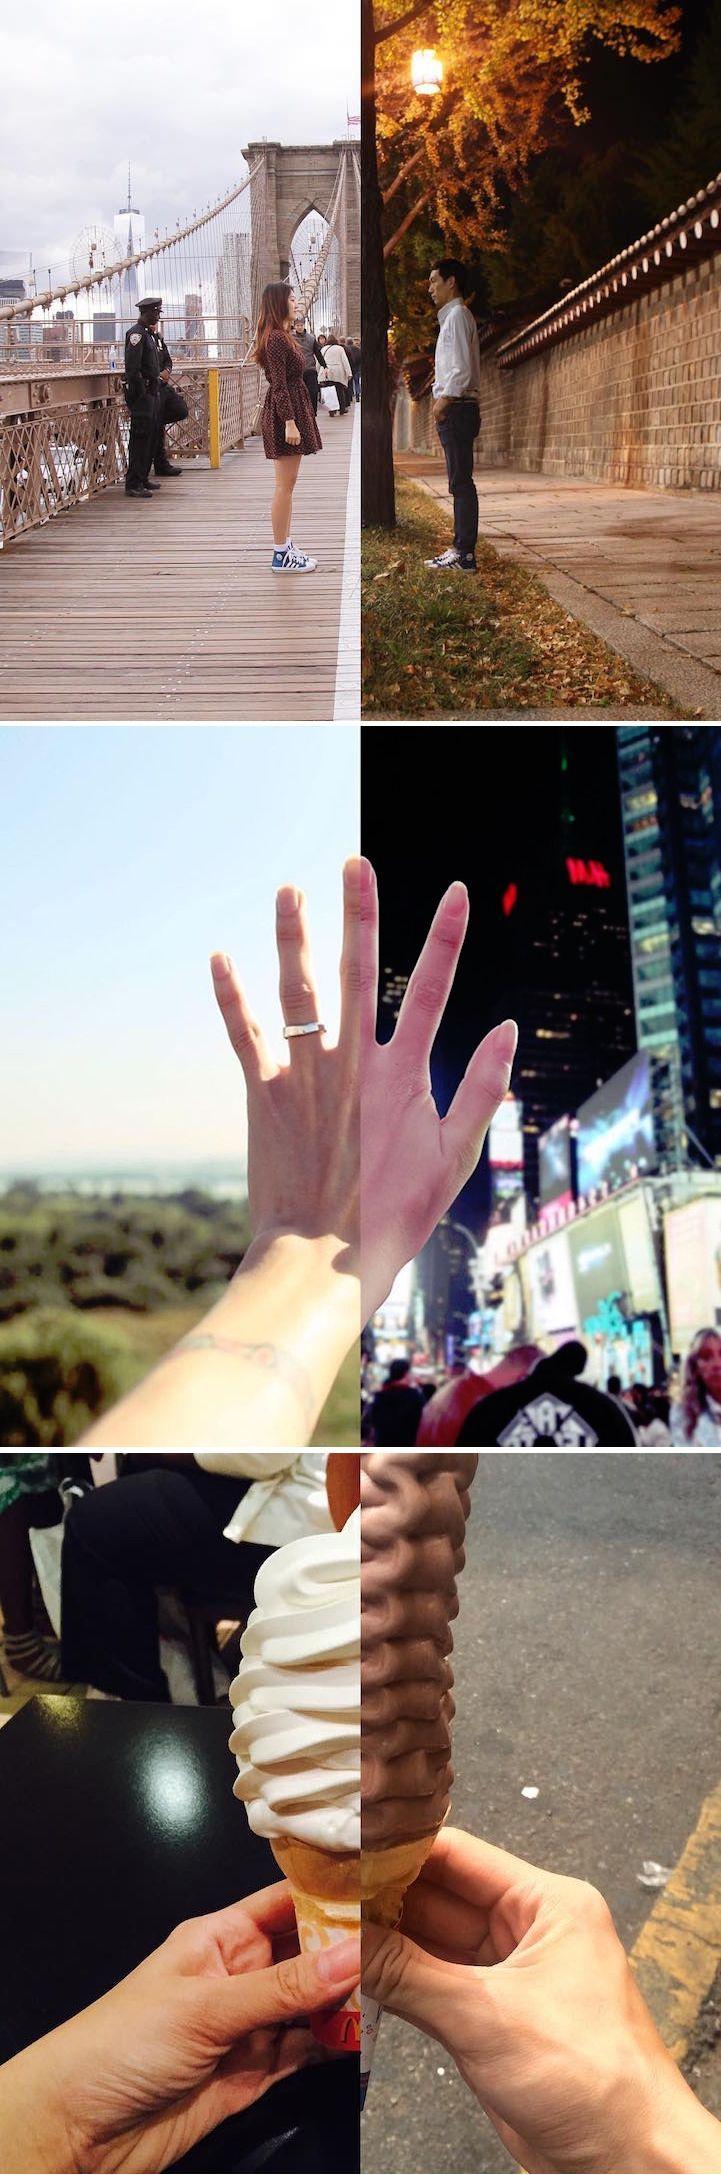 Long Distance Couple Stays Connected through Split Portraits of Parallel Experiences